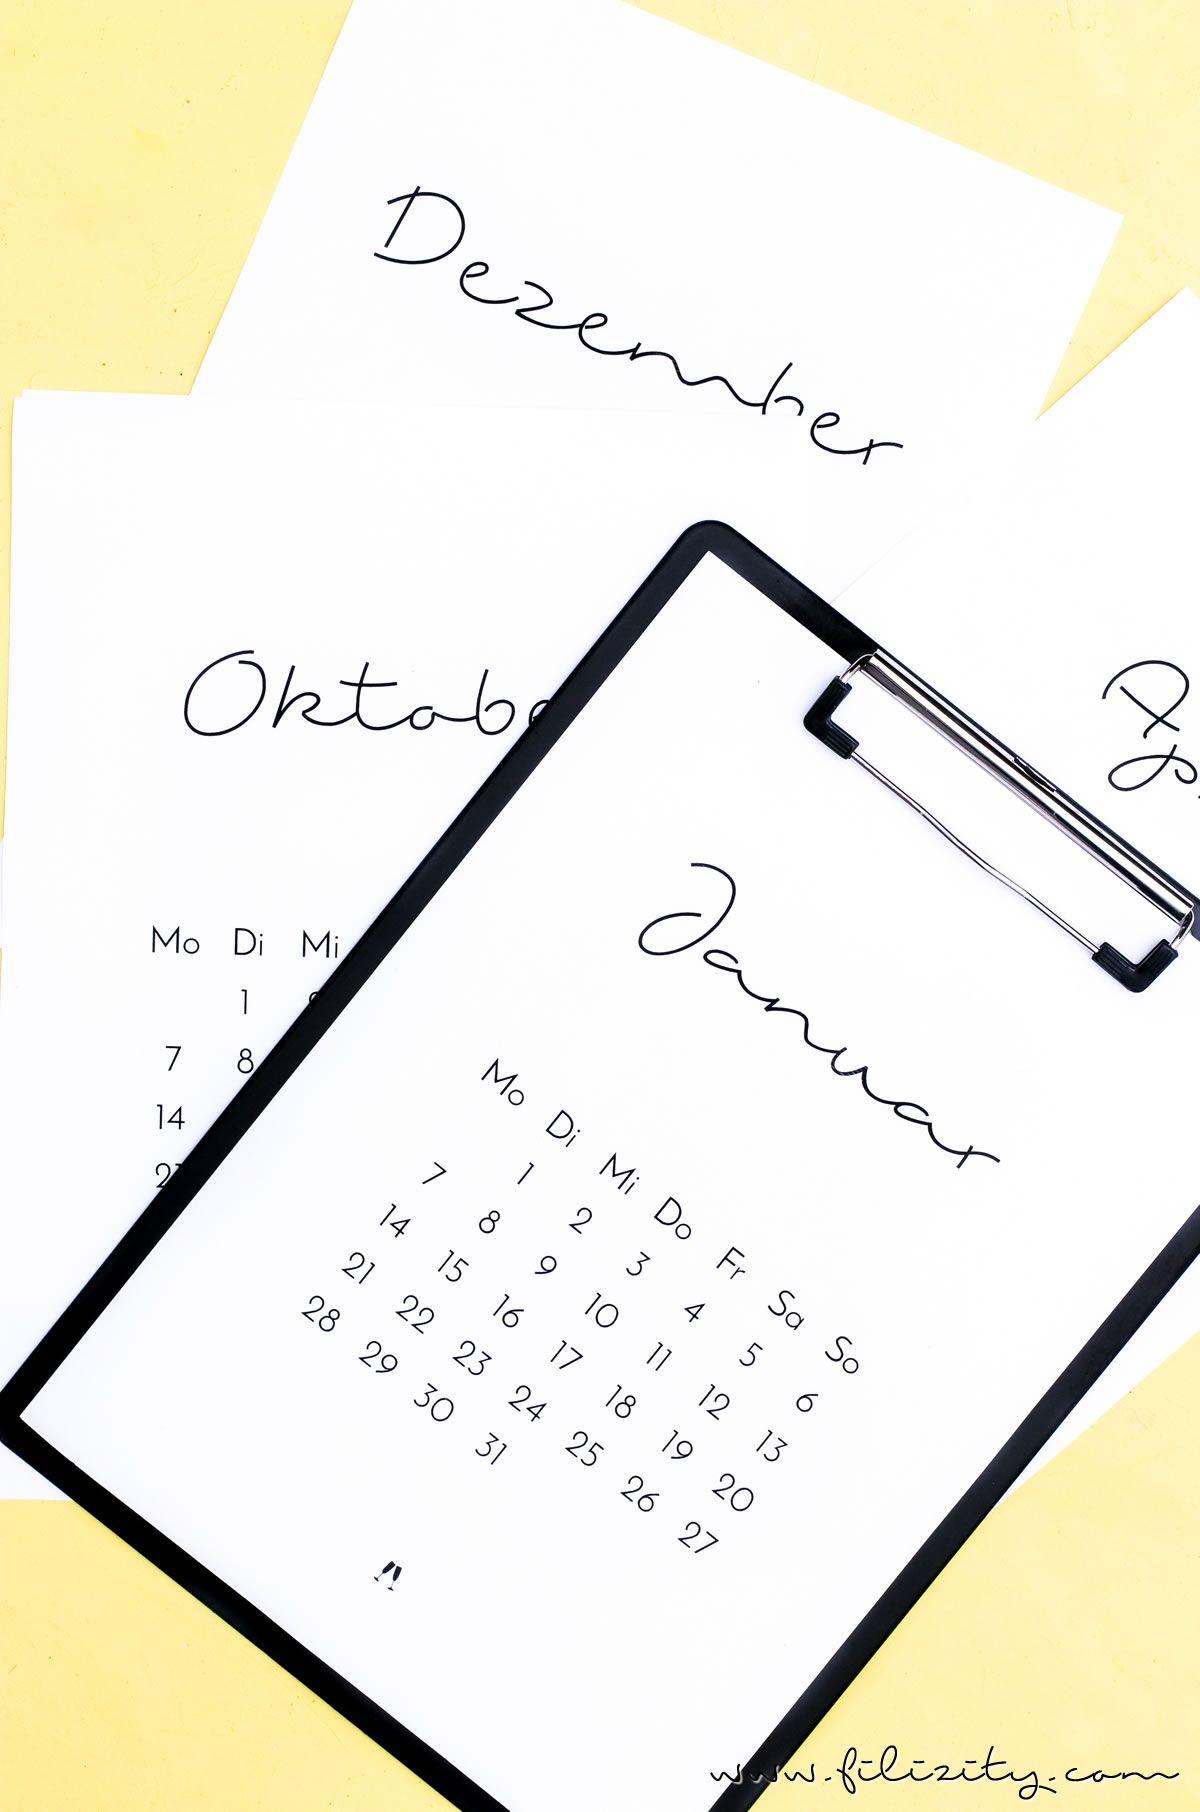 druckvorlage minimalistischer kalender 2019 home decor. Black Bedroom Furniture Sets. Home Design Ideas